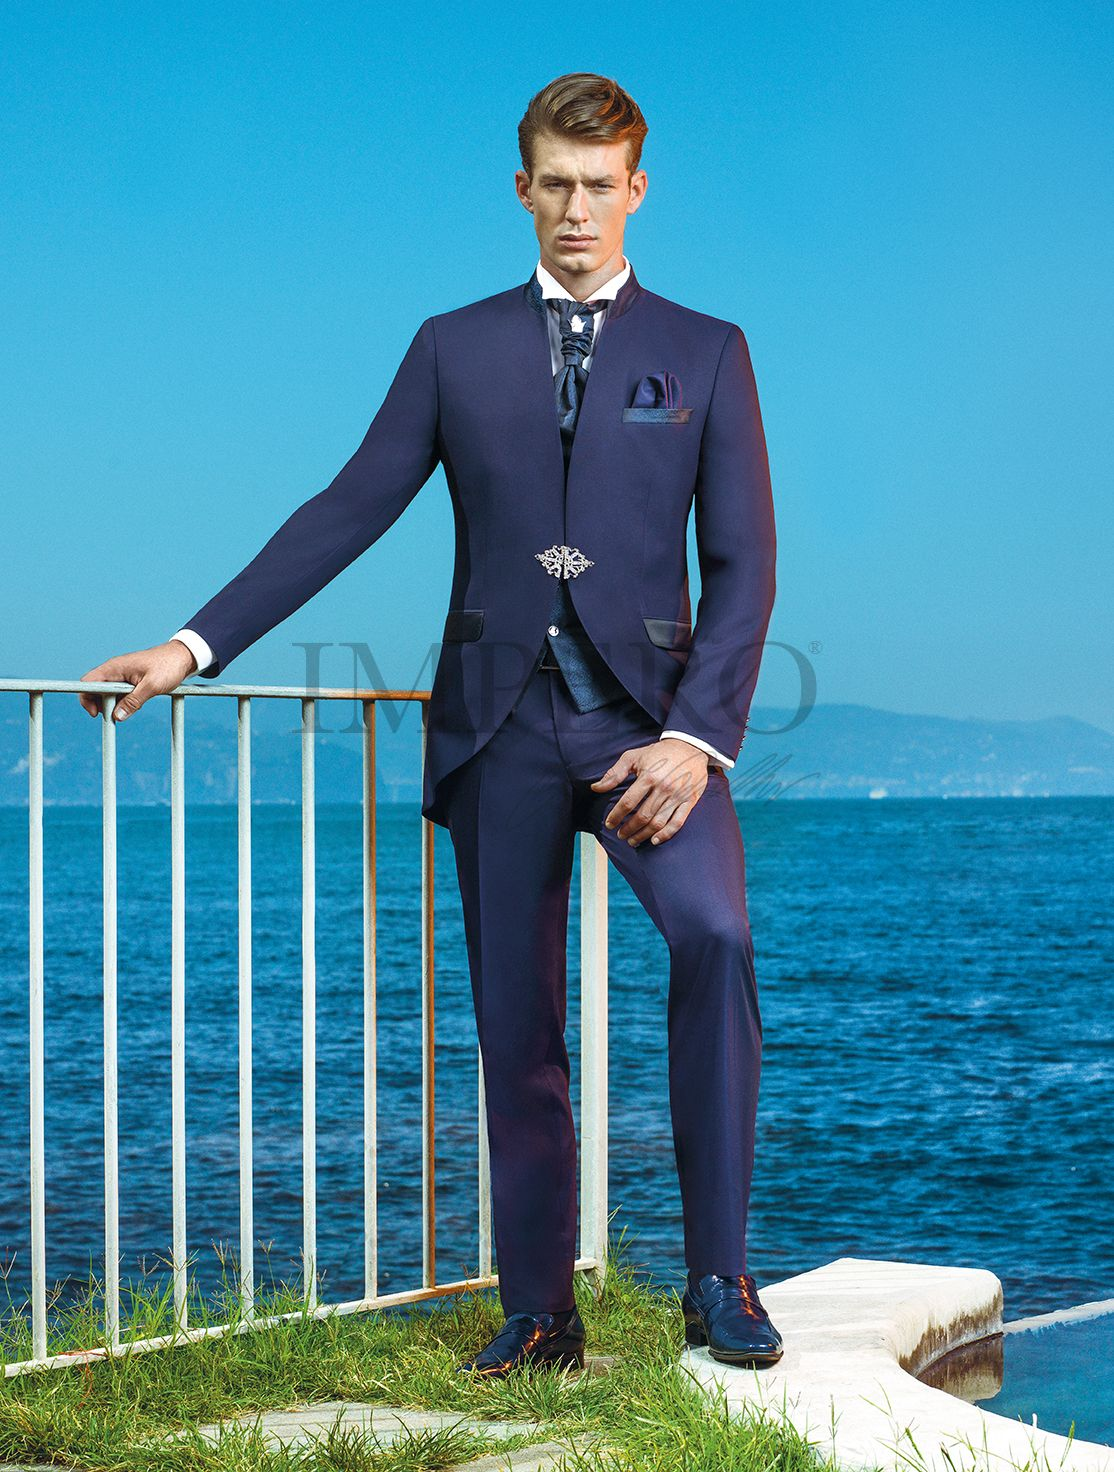 BA 2026-17 #sposo #groom #suit #abito #wedding #matrimonio #nozze ...